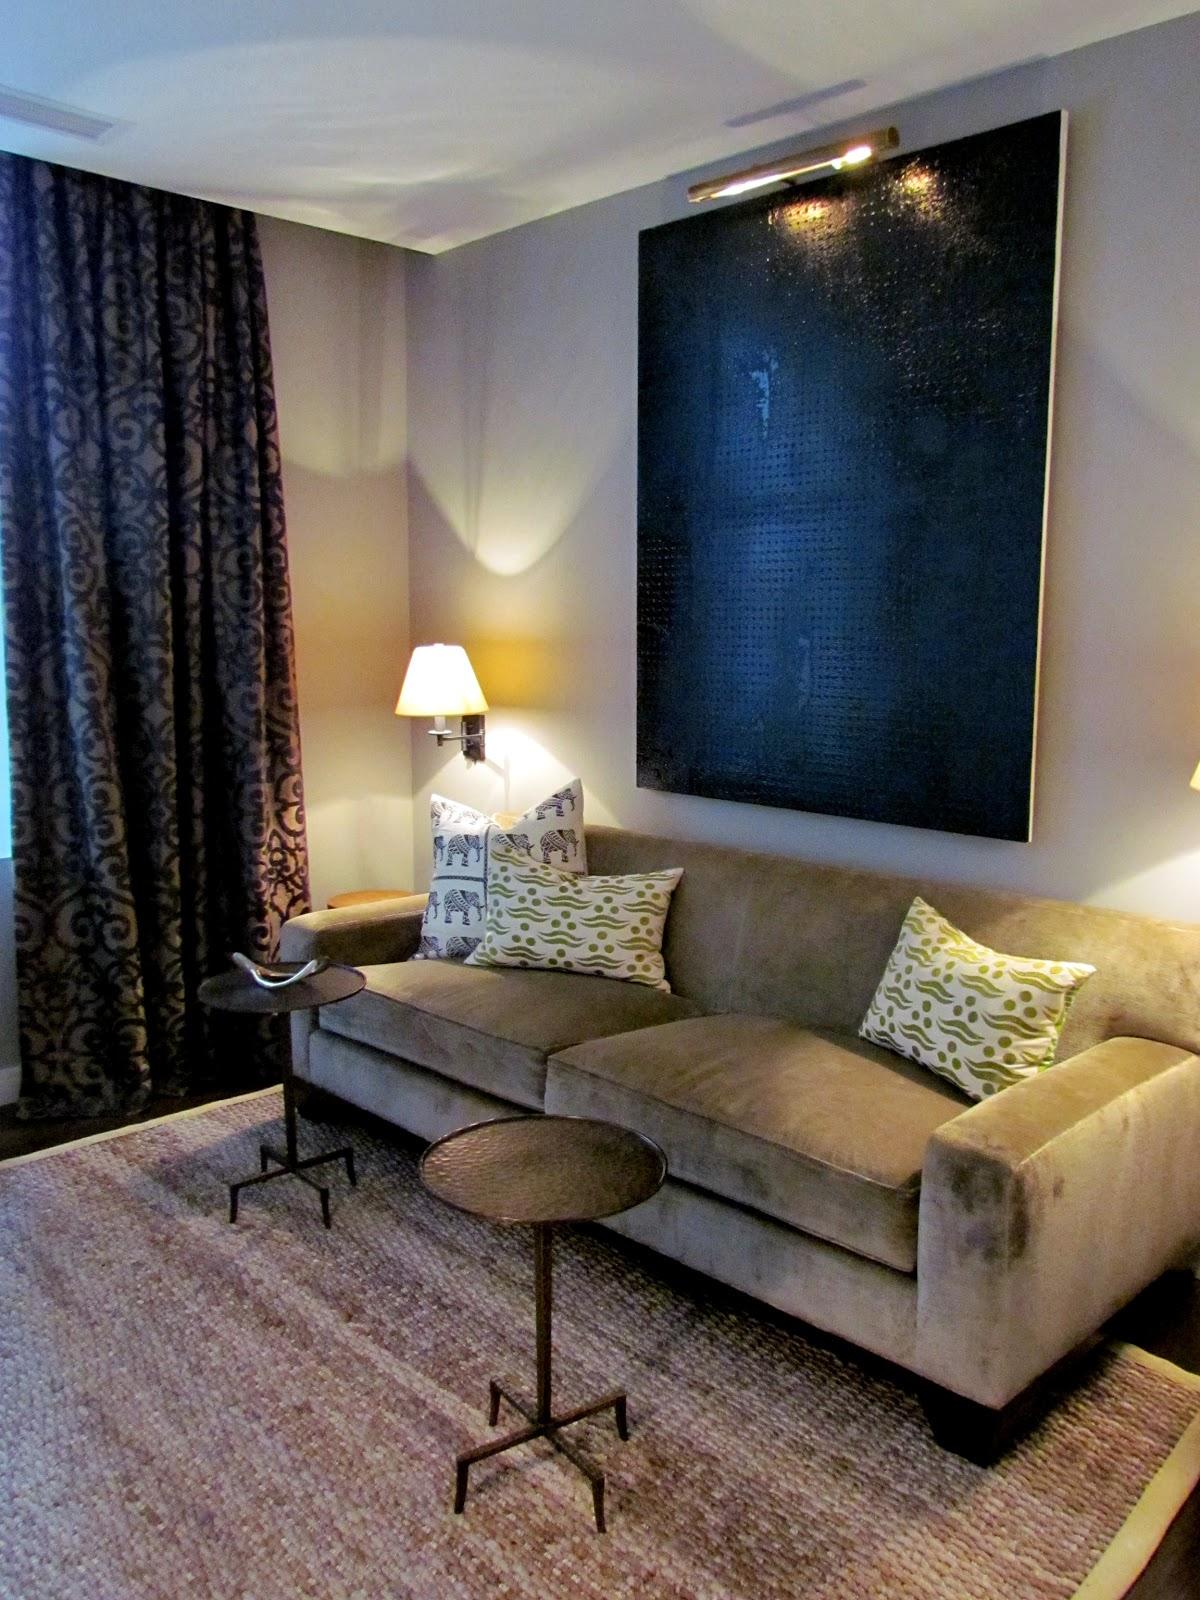 Antony Todd Sofa Corner Bed Adelaide Dec A Porter Imagination Home Designer Visions